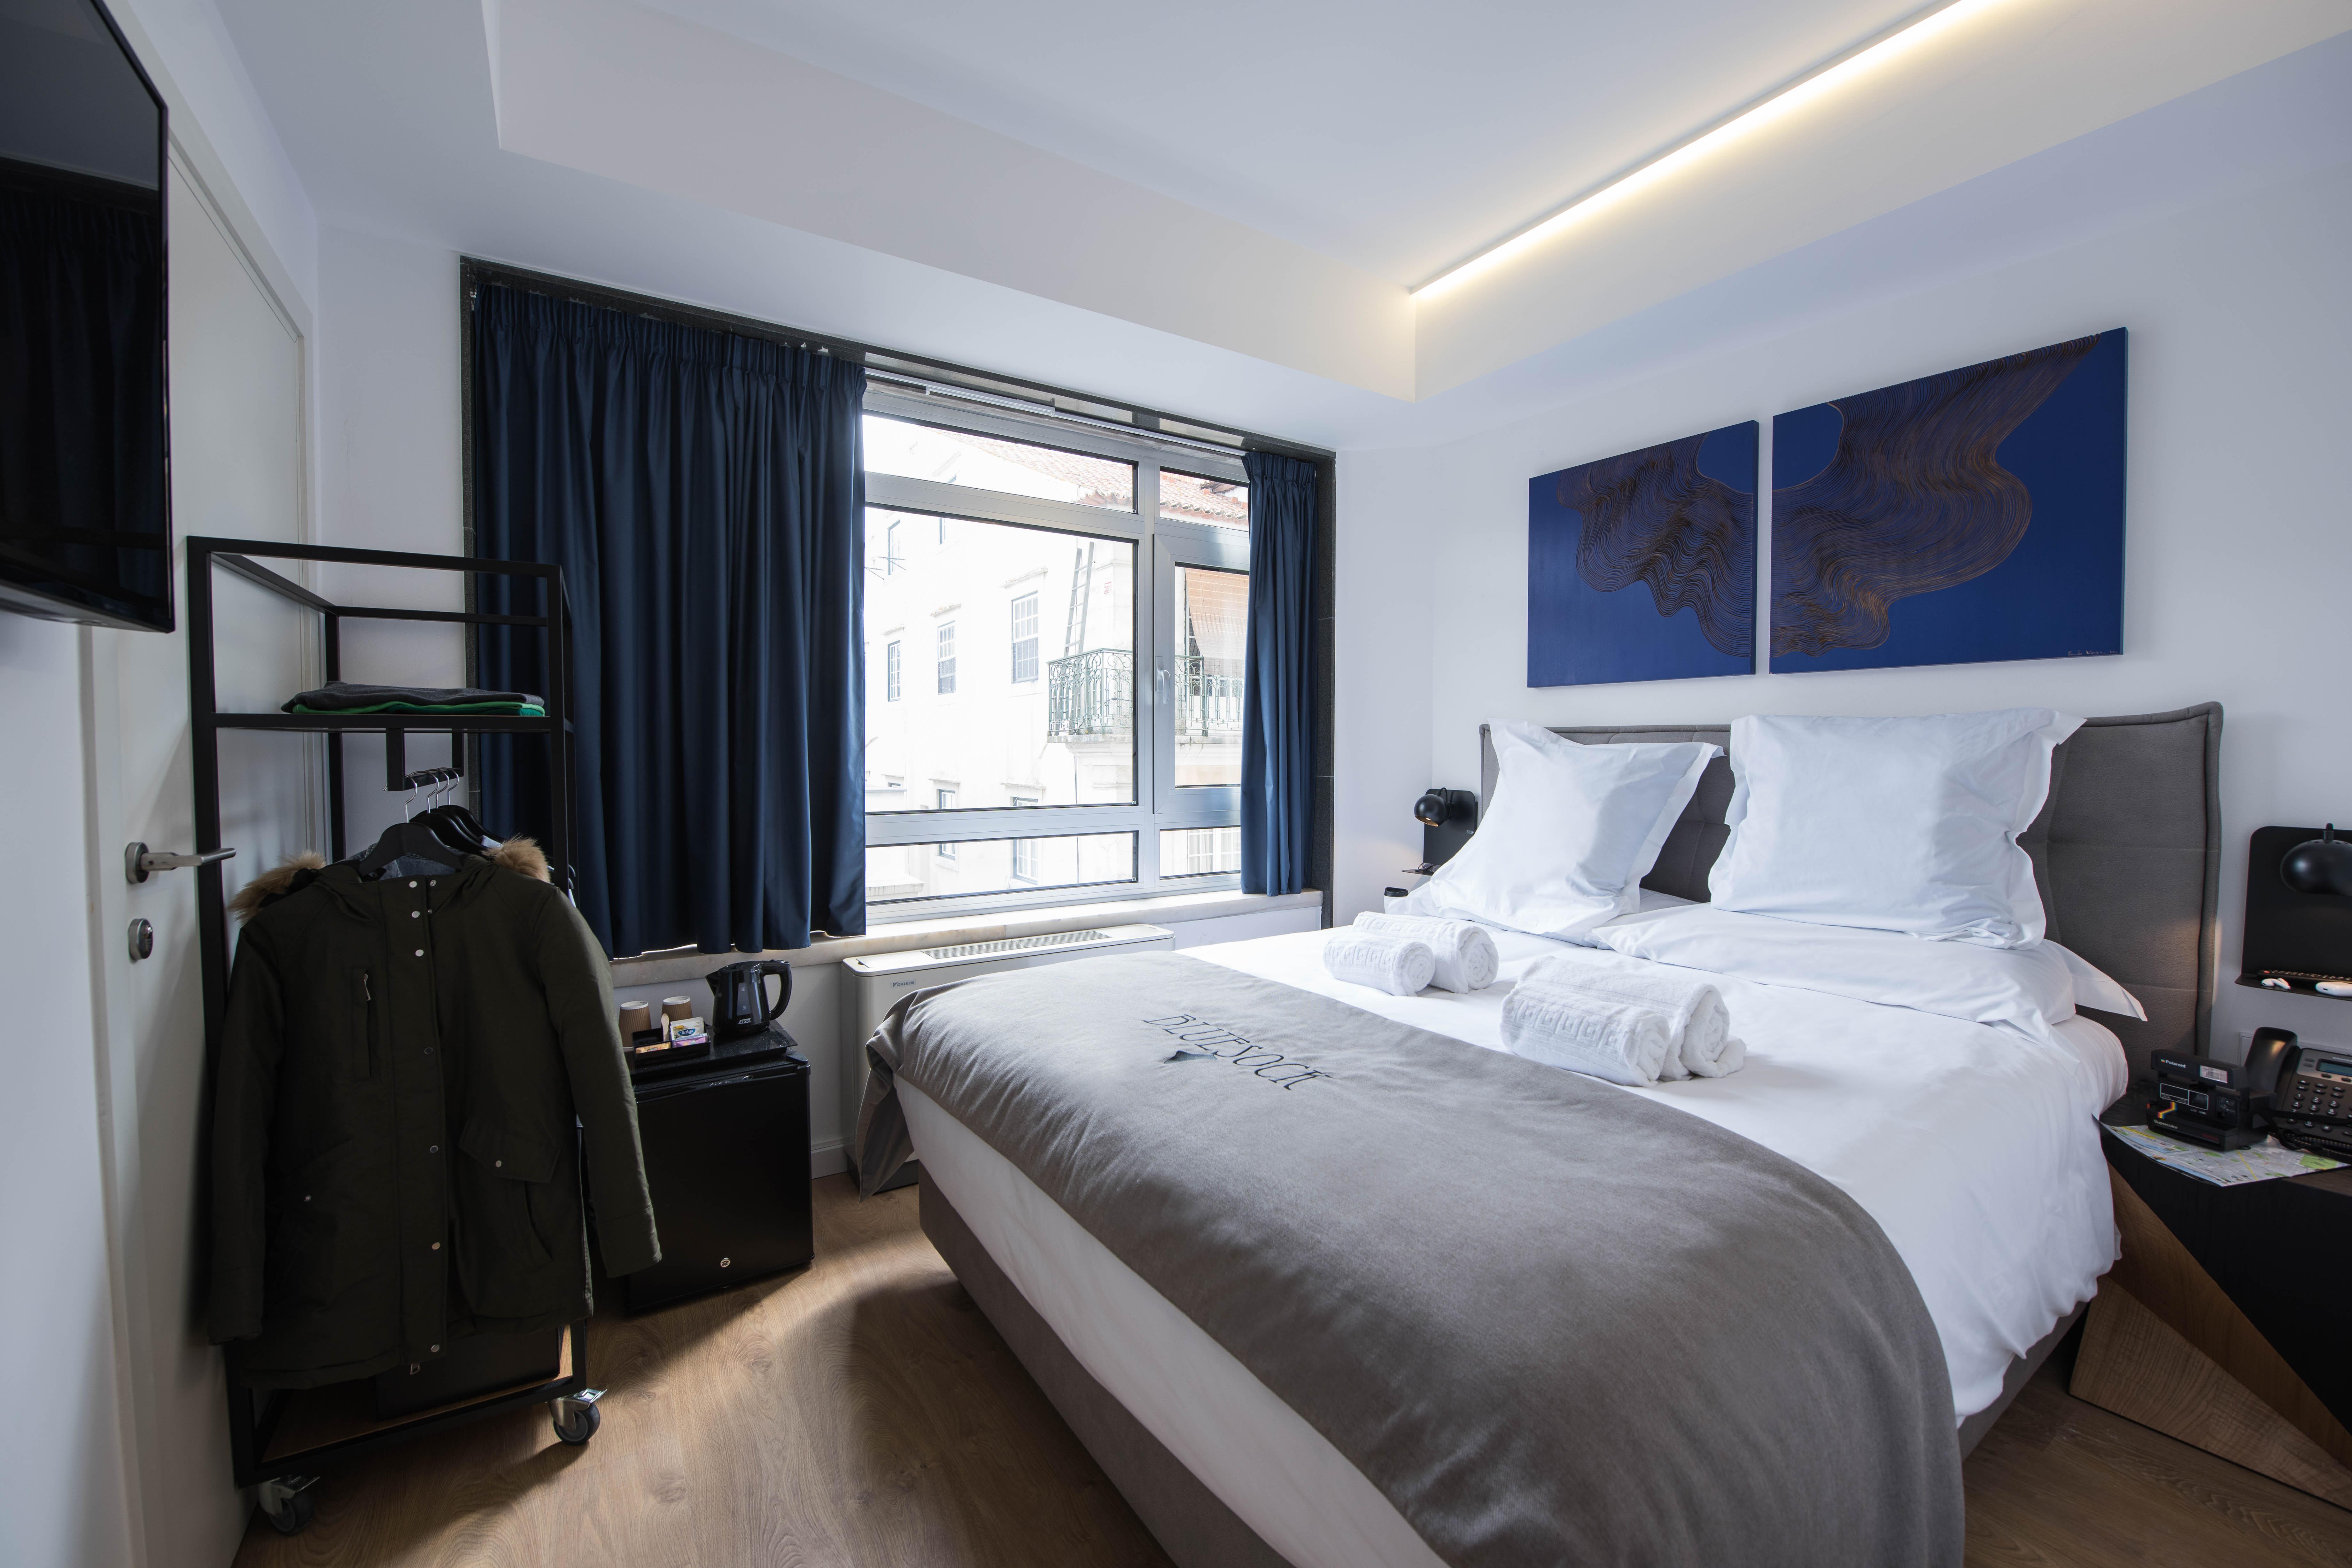 HOSTEL - Bluesock Hostels Lisboa